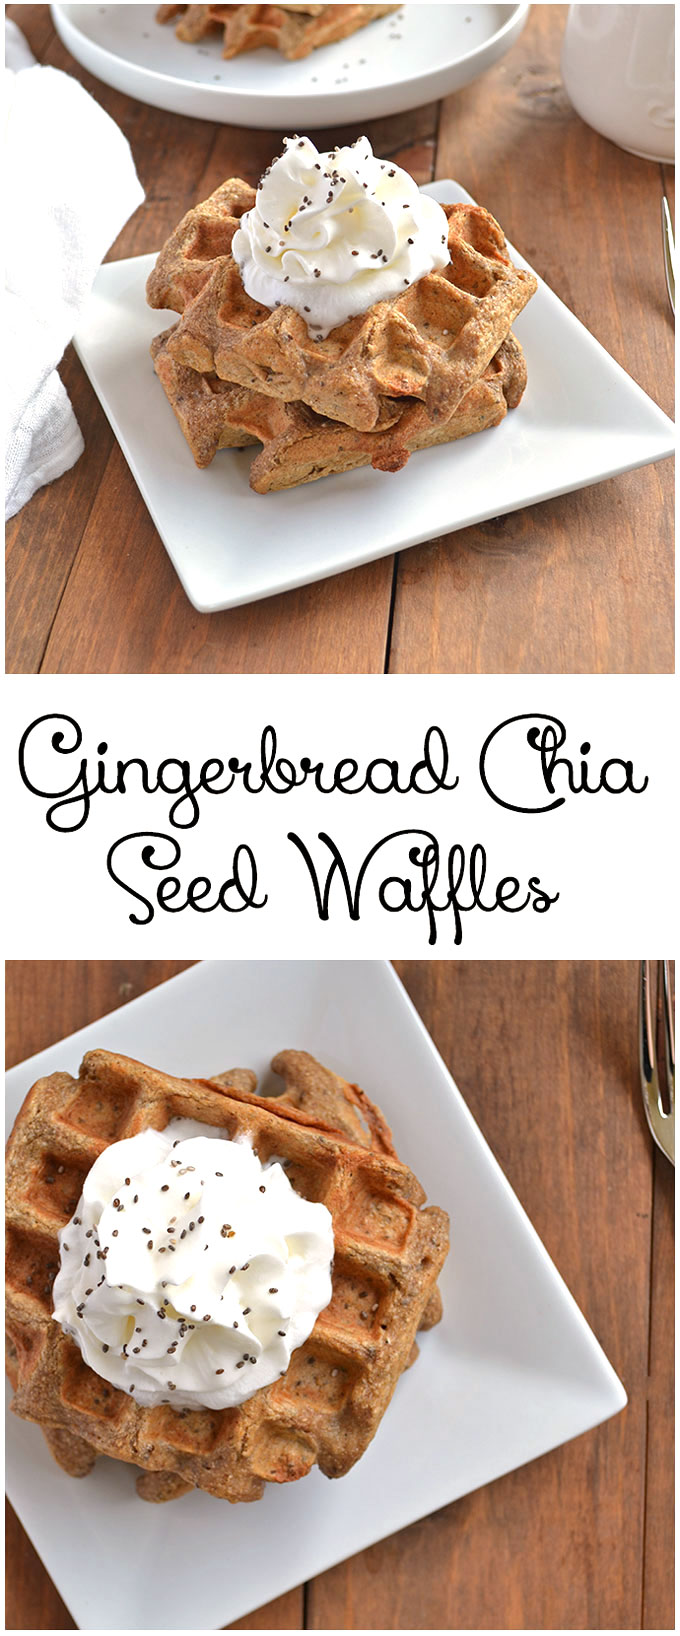 Gingerbread-Chia-Seed-Wafffles